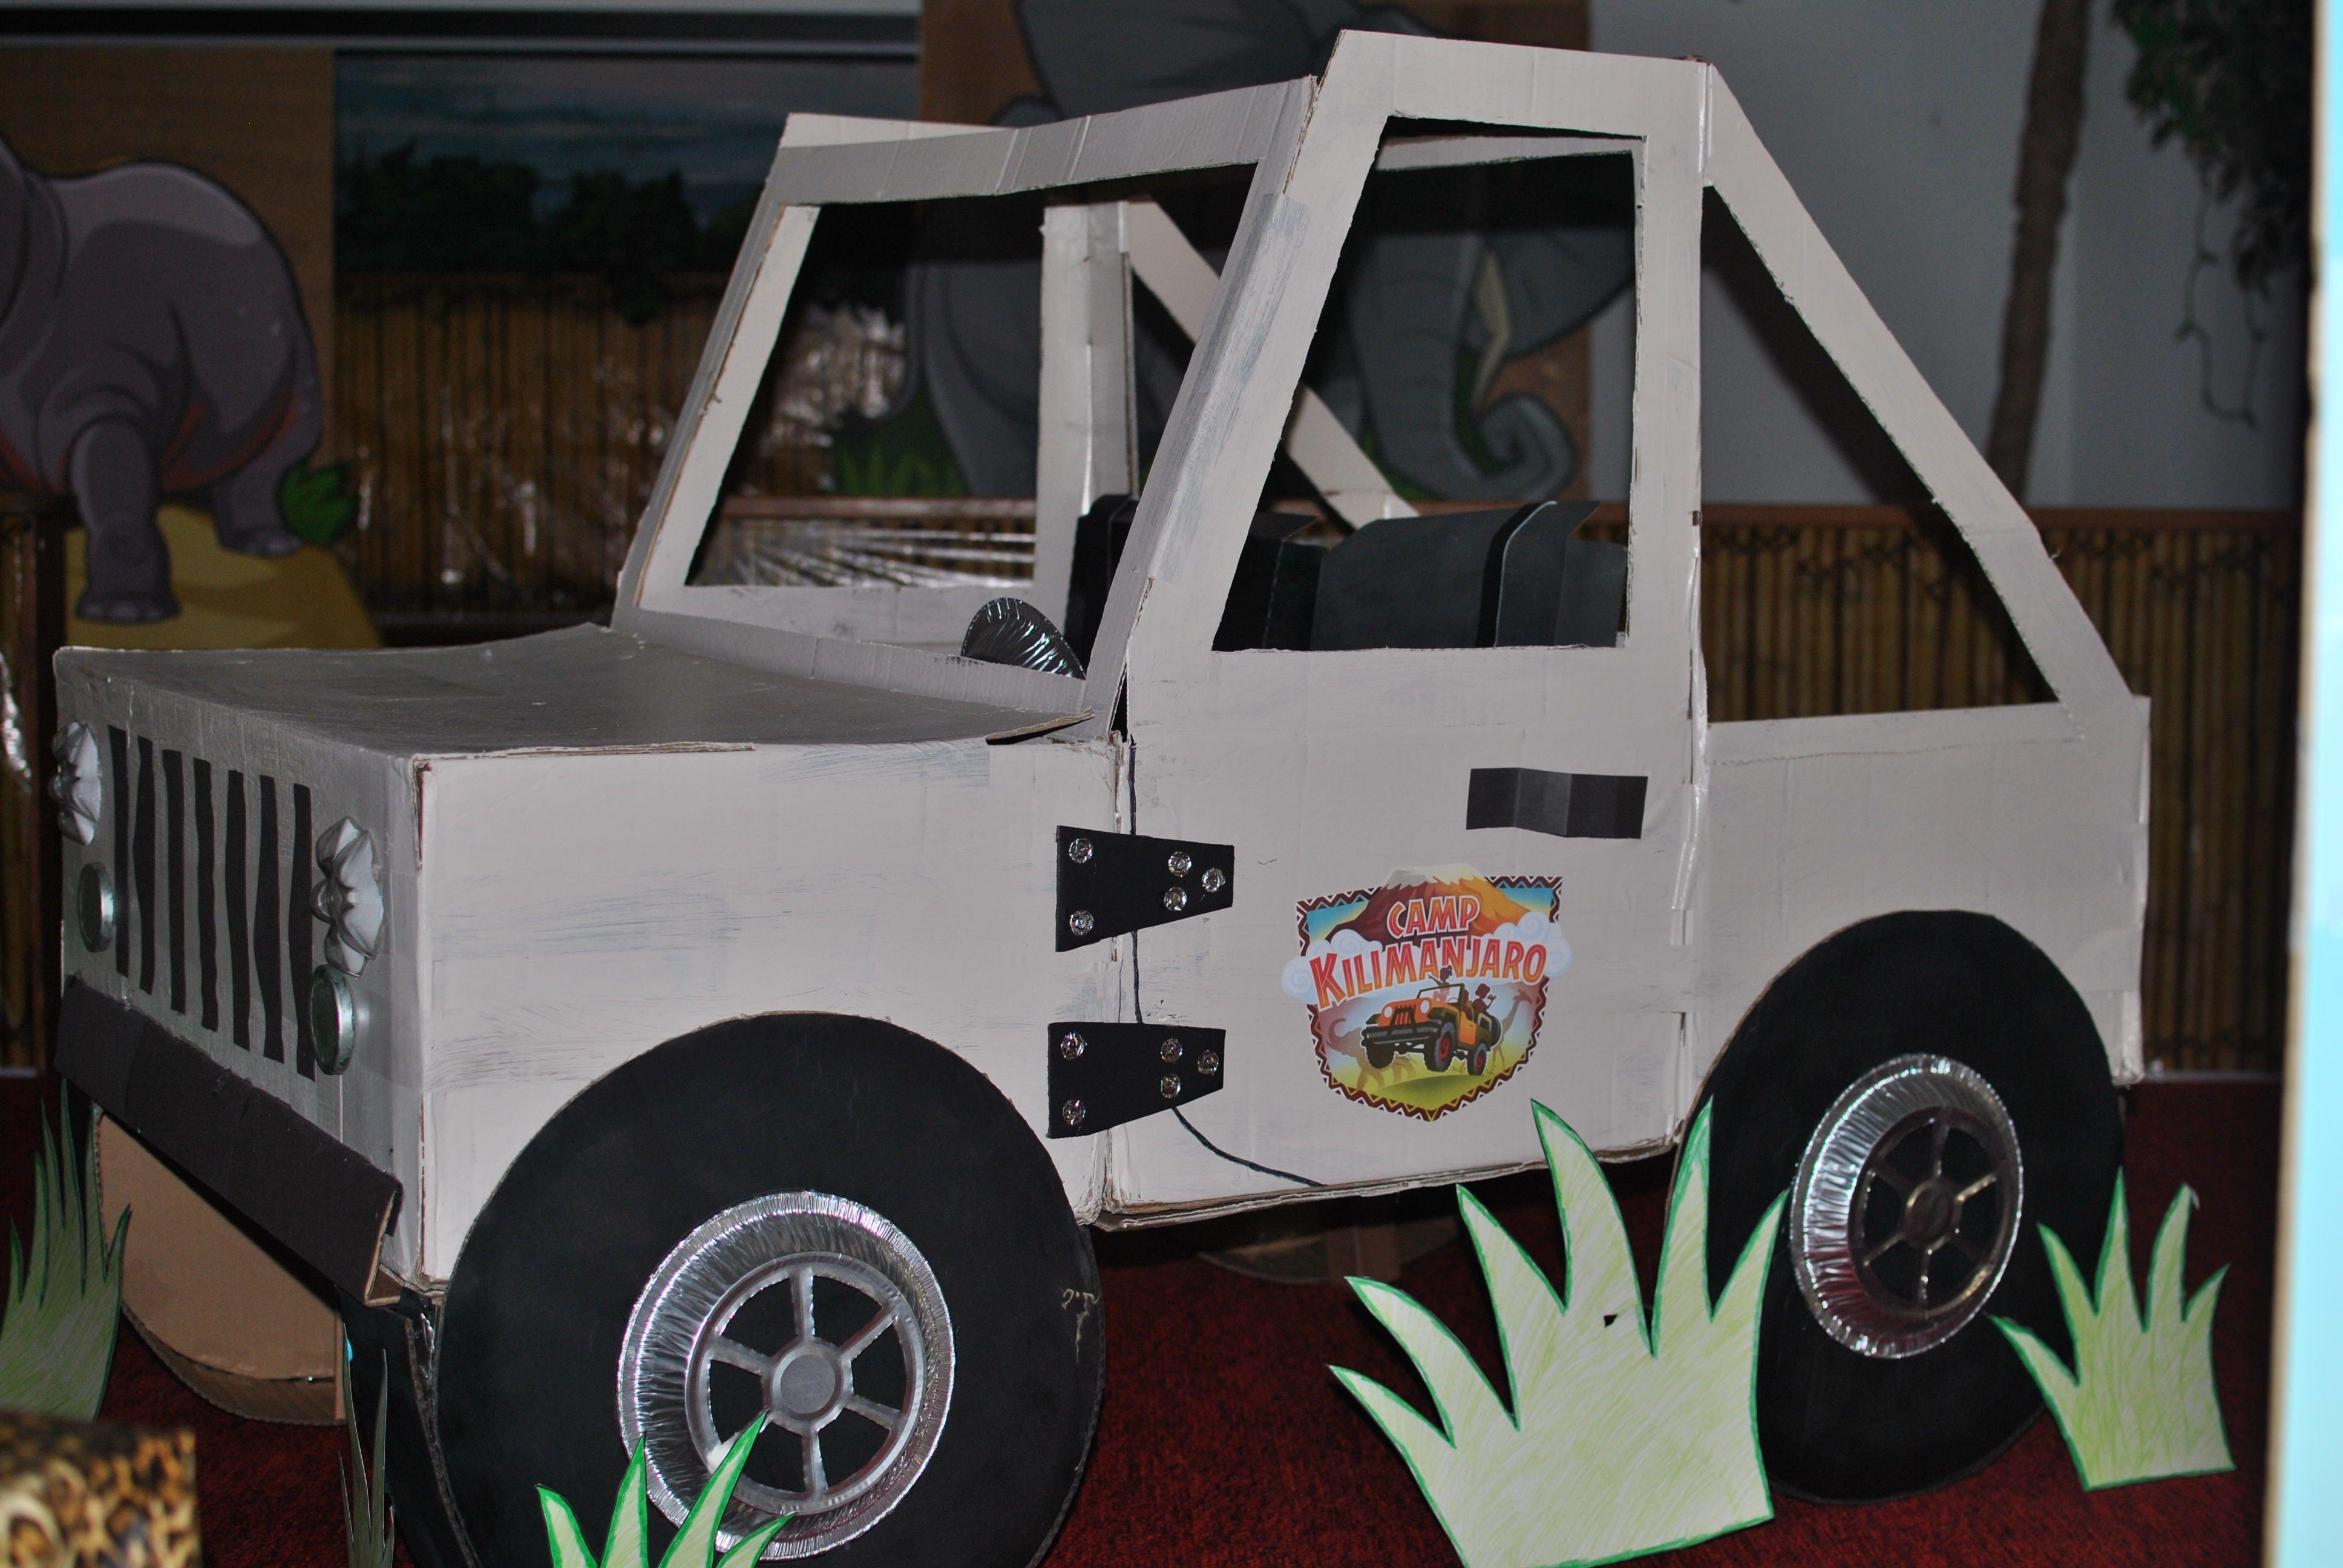 Camp Kilimanjaro Jeep Vbs 2015 Kids Jeep Cardboard